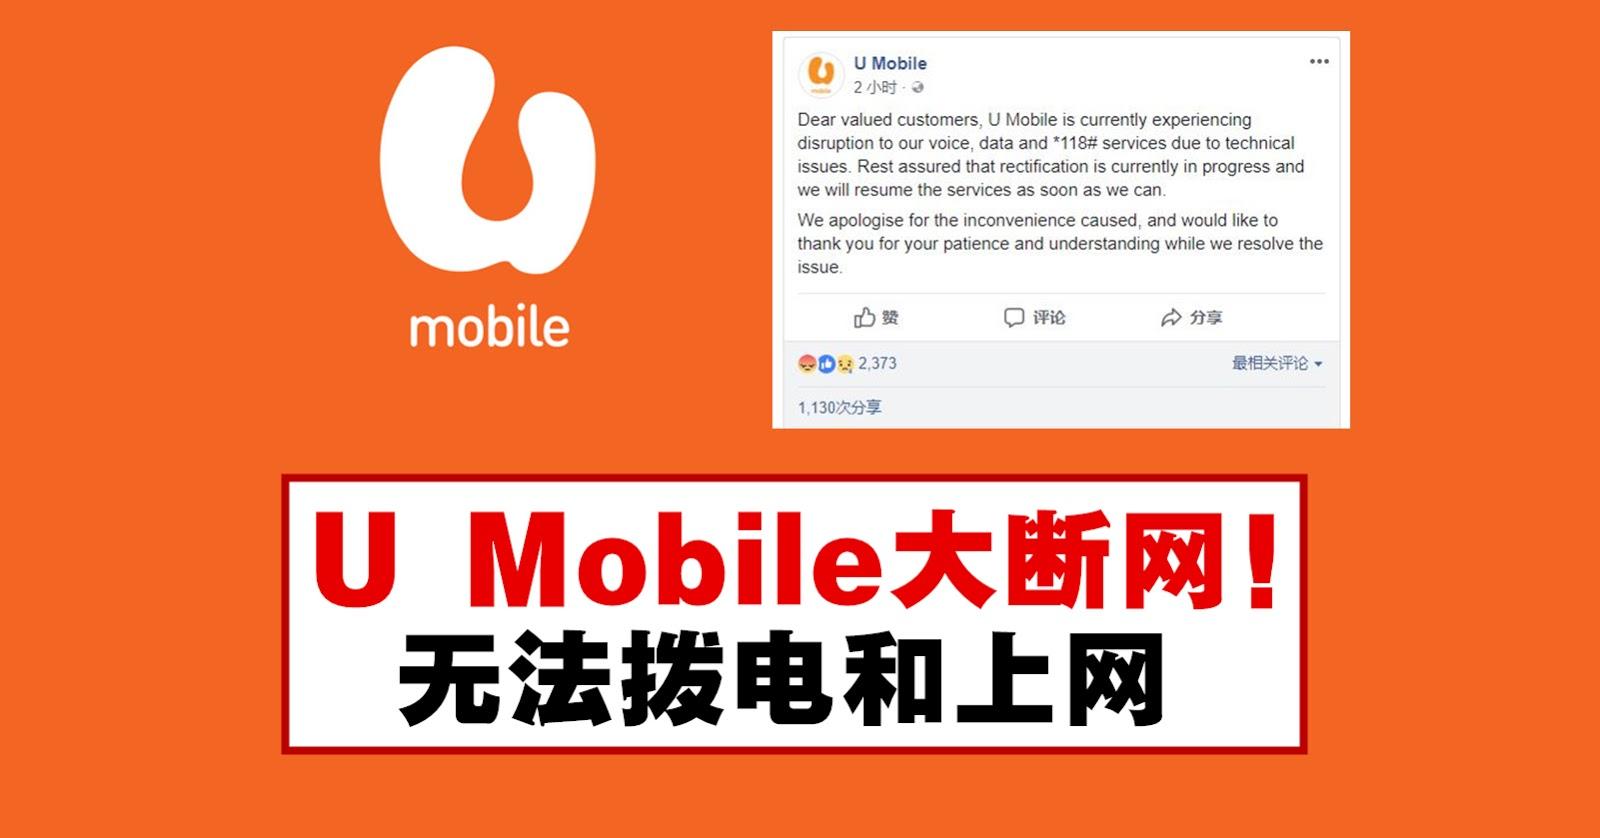 U Mobile大断网!无法拨电和上网